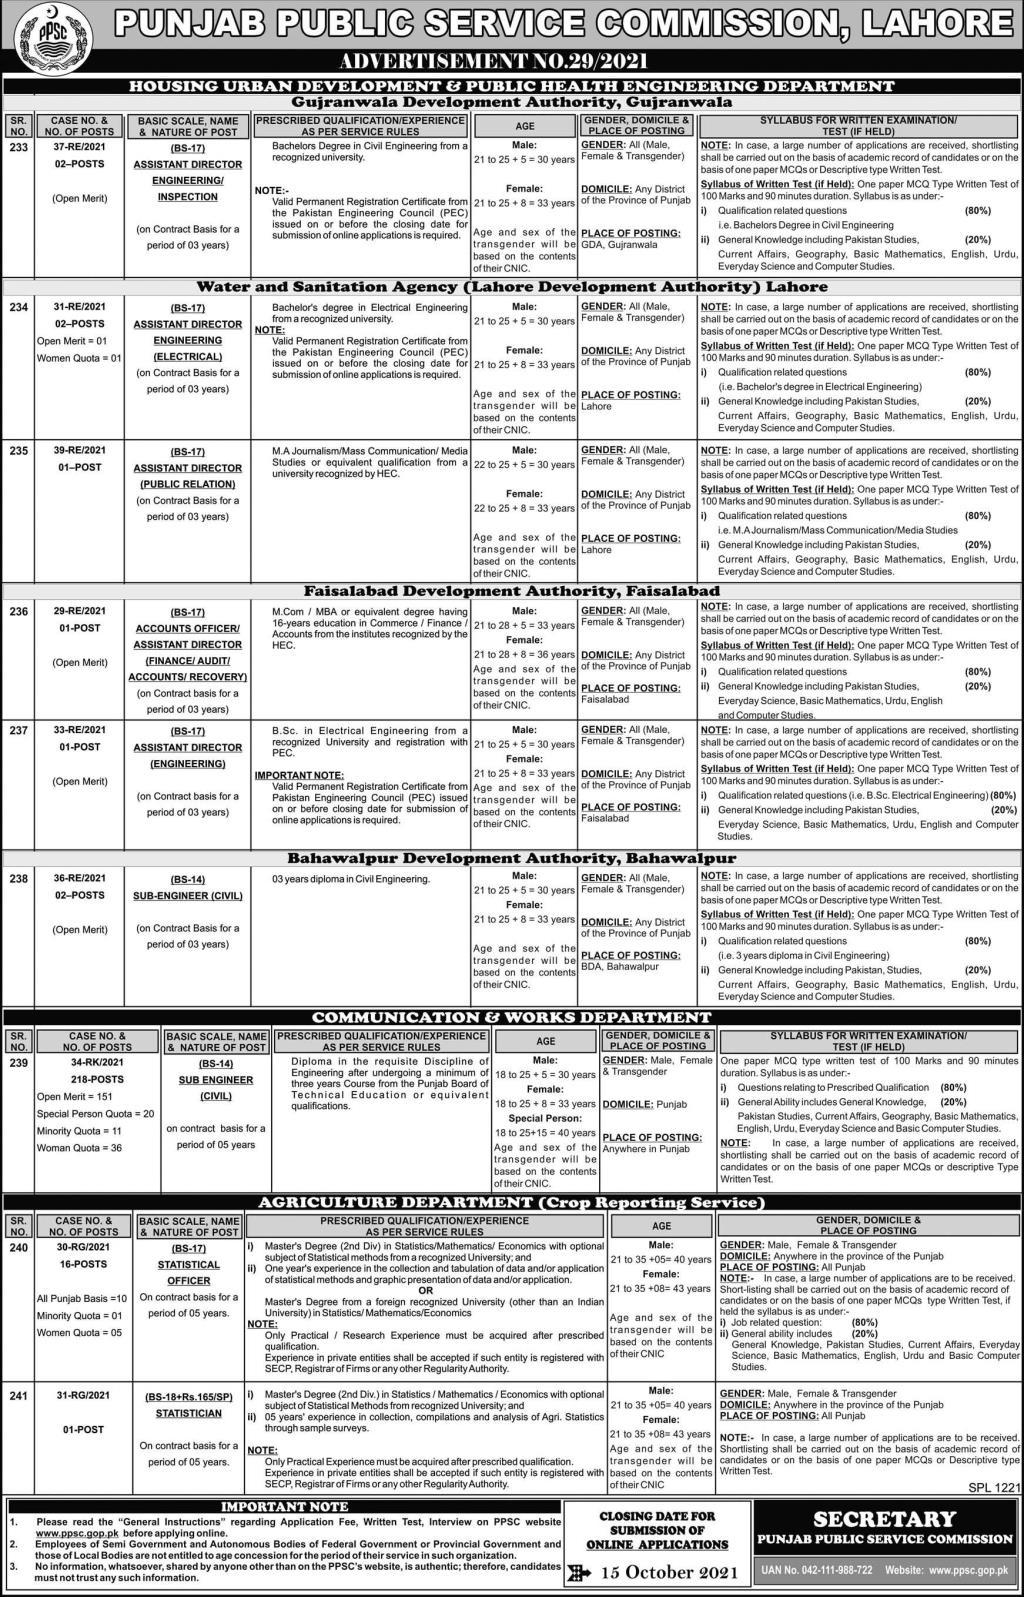 PPSC Jobs 2021 Advertisement 29/2021